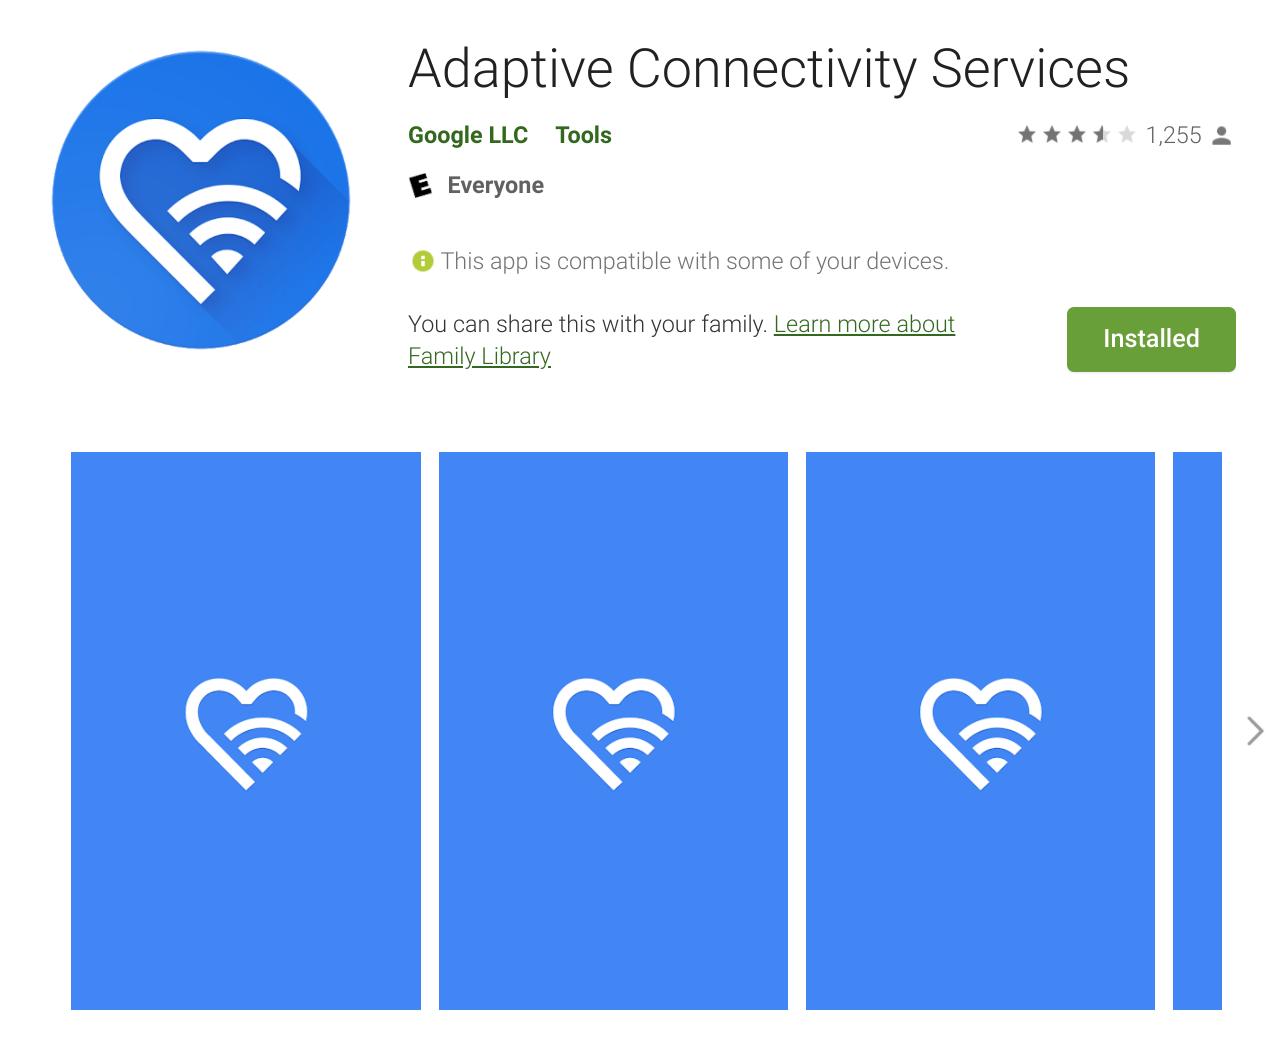 Google Adaptive Connectivity Services